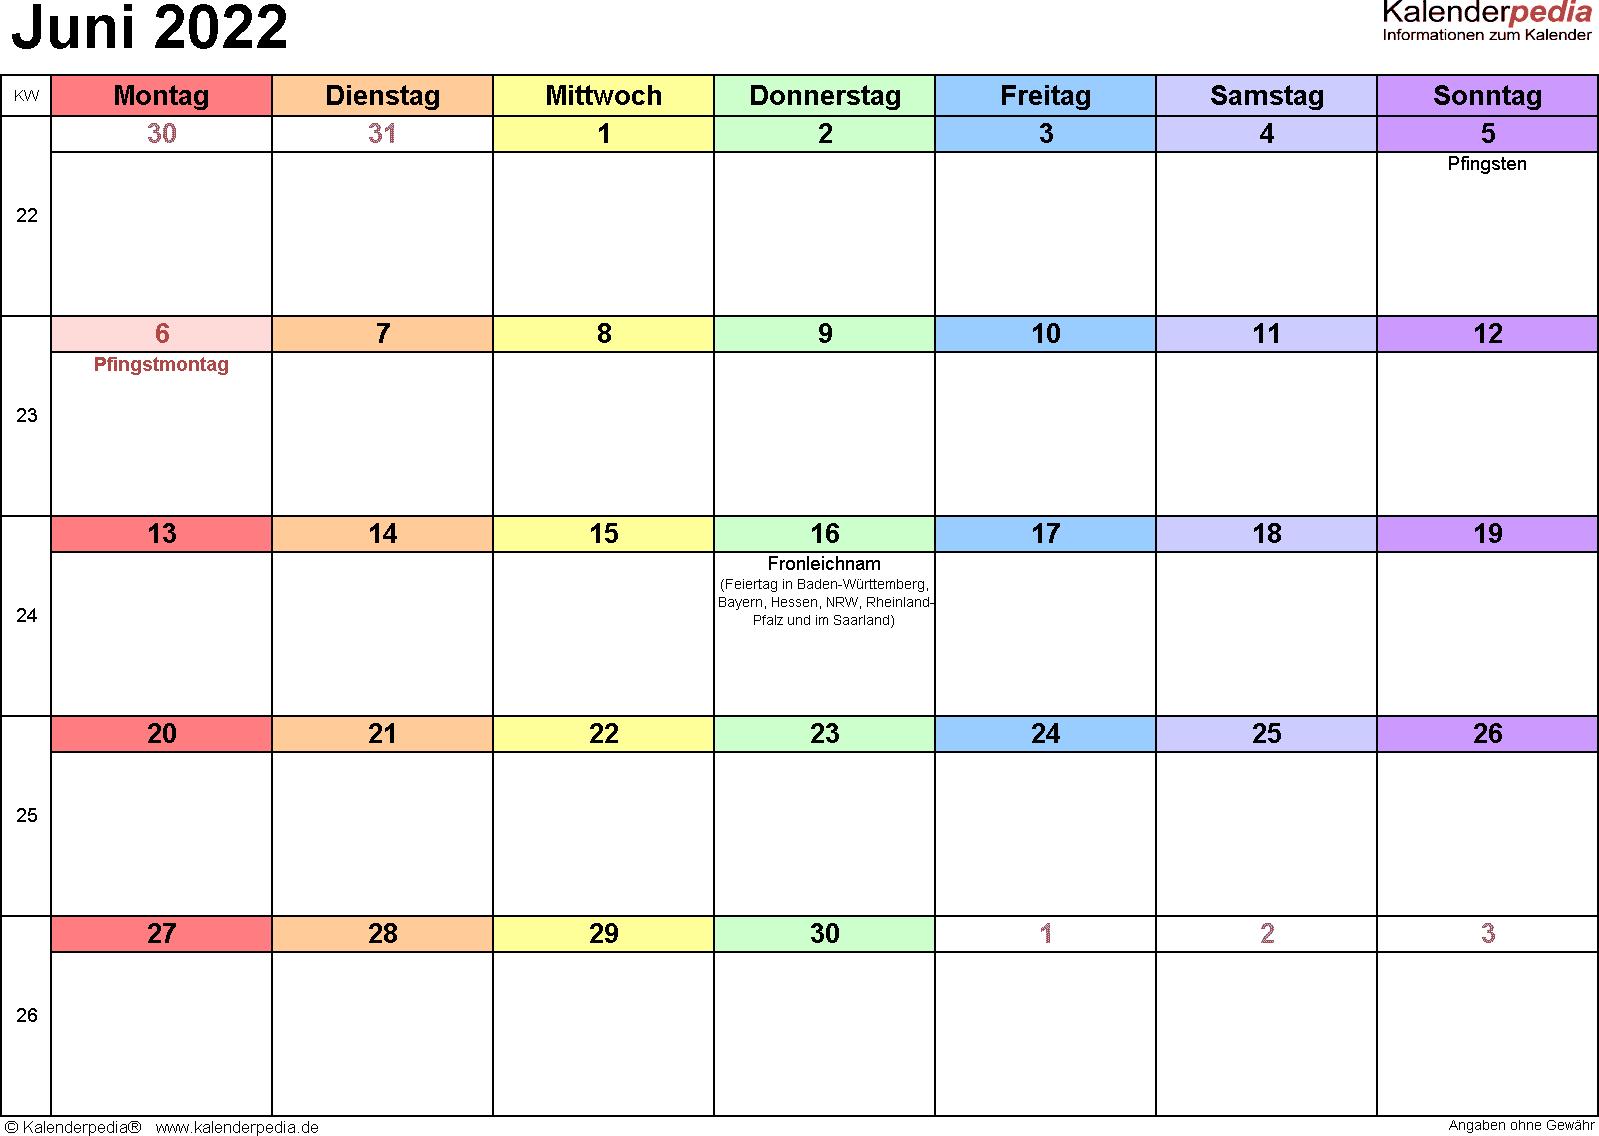 Kalender Juni 2022 (Querformat) als Excel-Vorlage